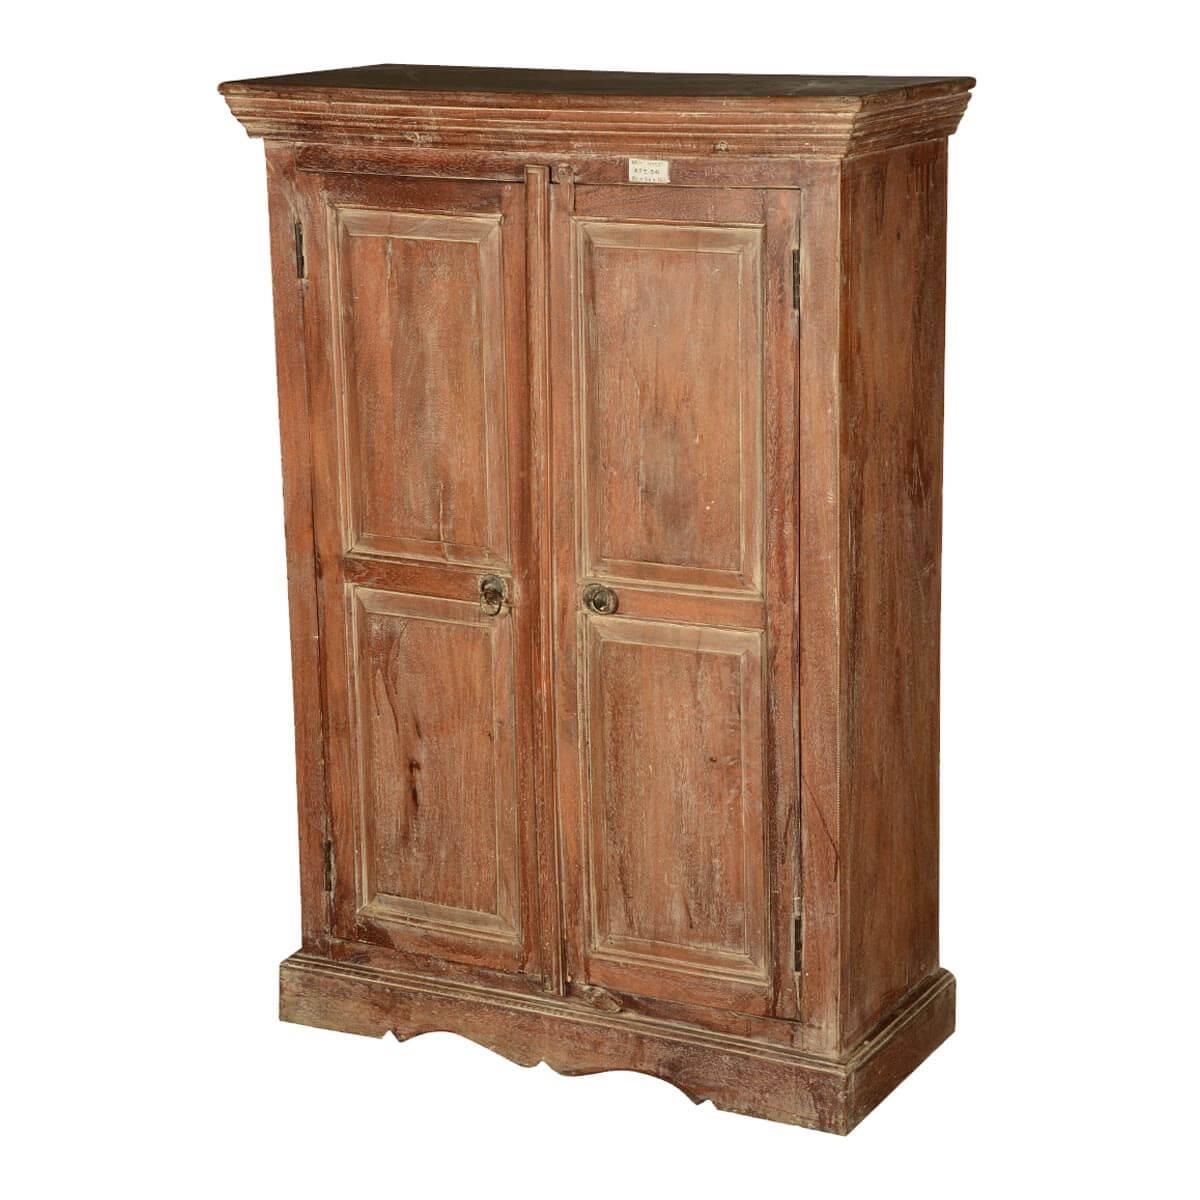 Colonial American Rustic Reclaimed Wood Freestanding Cabinet